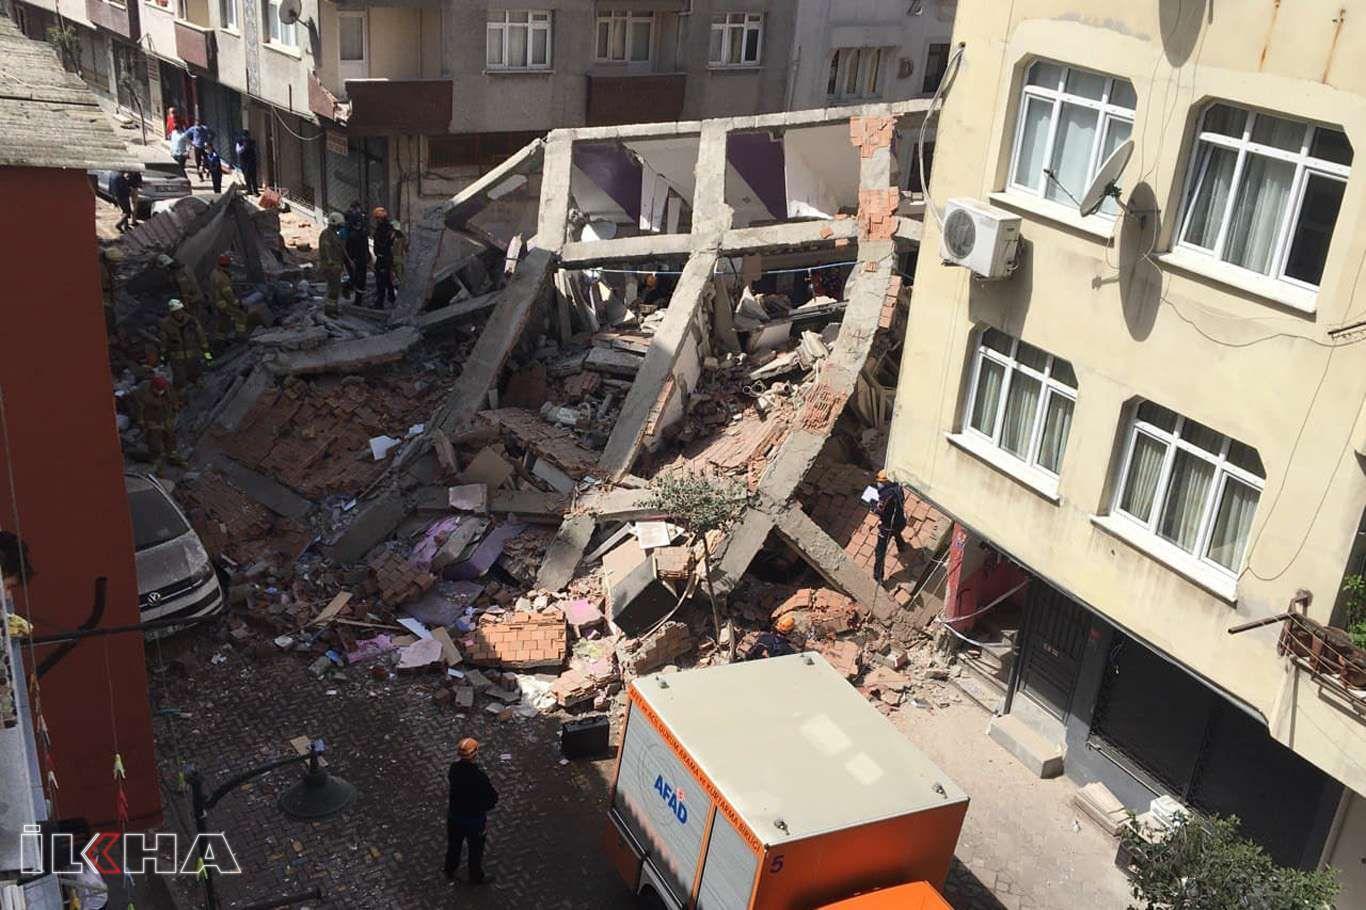 İstanbulda 5 katlı bir bina çöktü